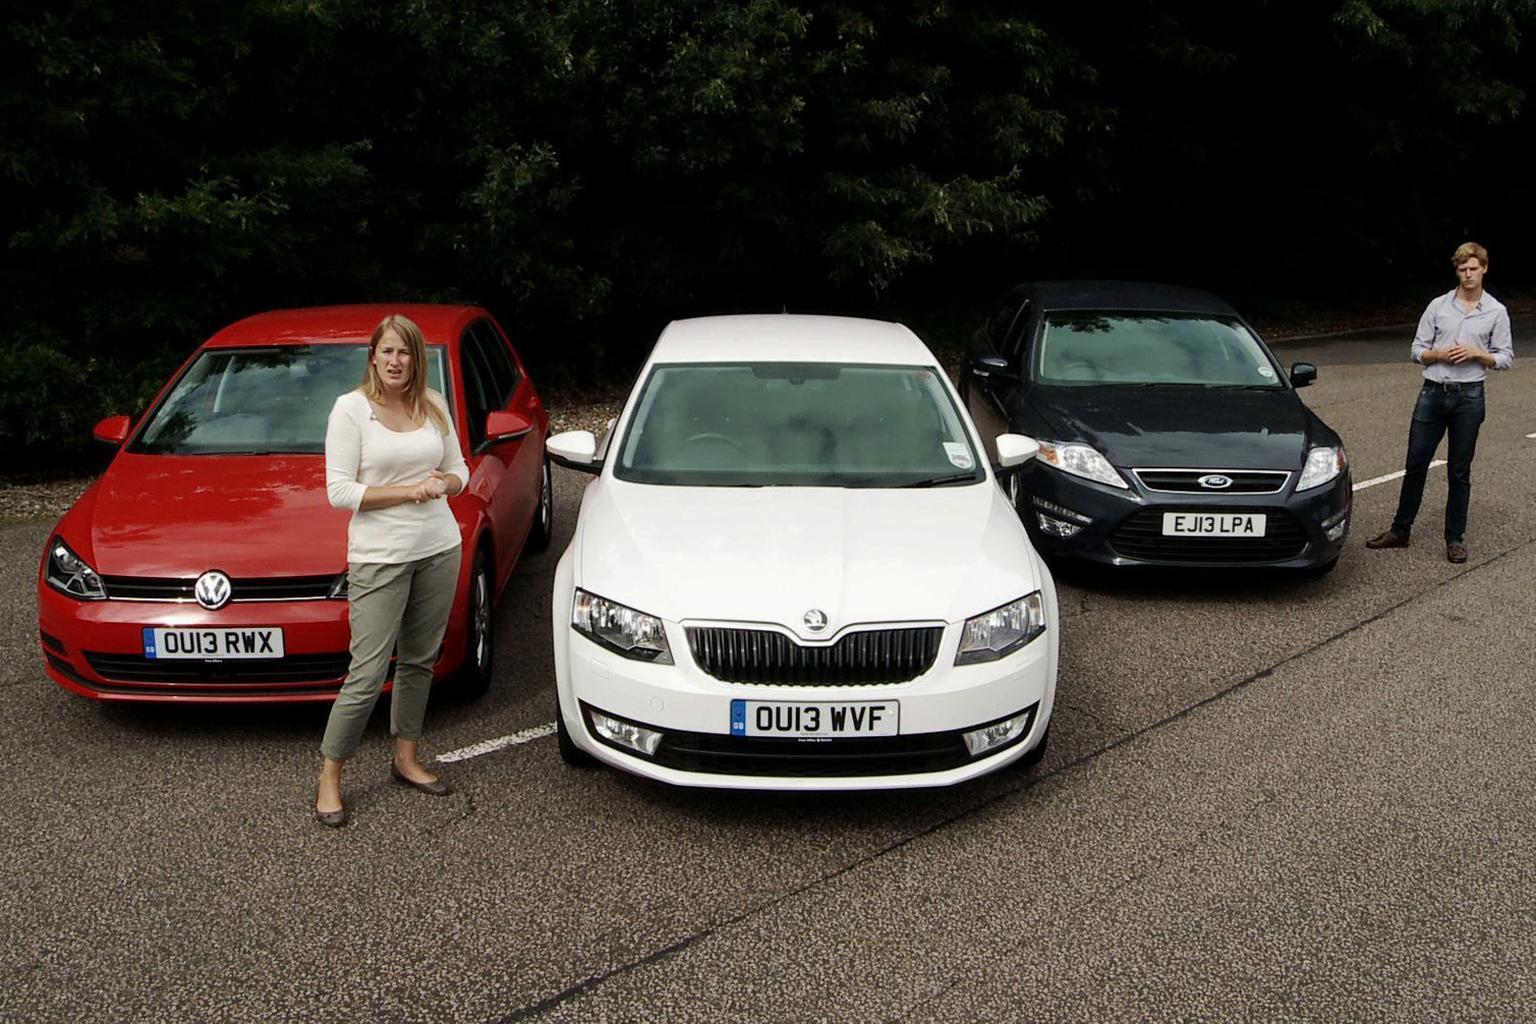 Octavia vs Golf vs Mondeo video group test